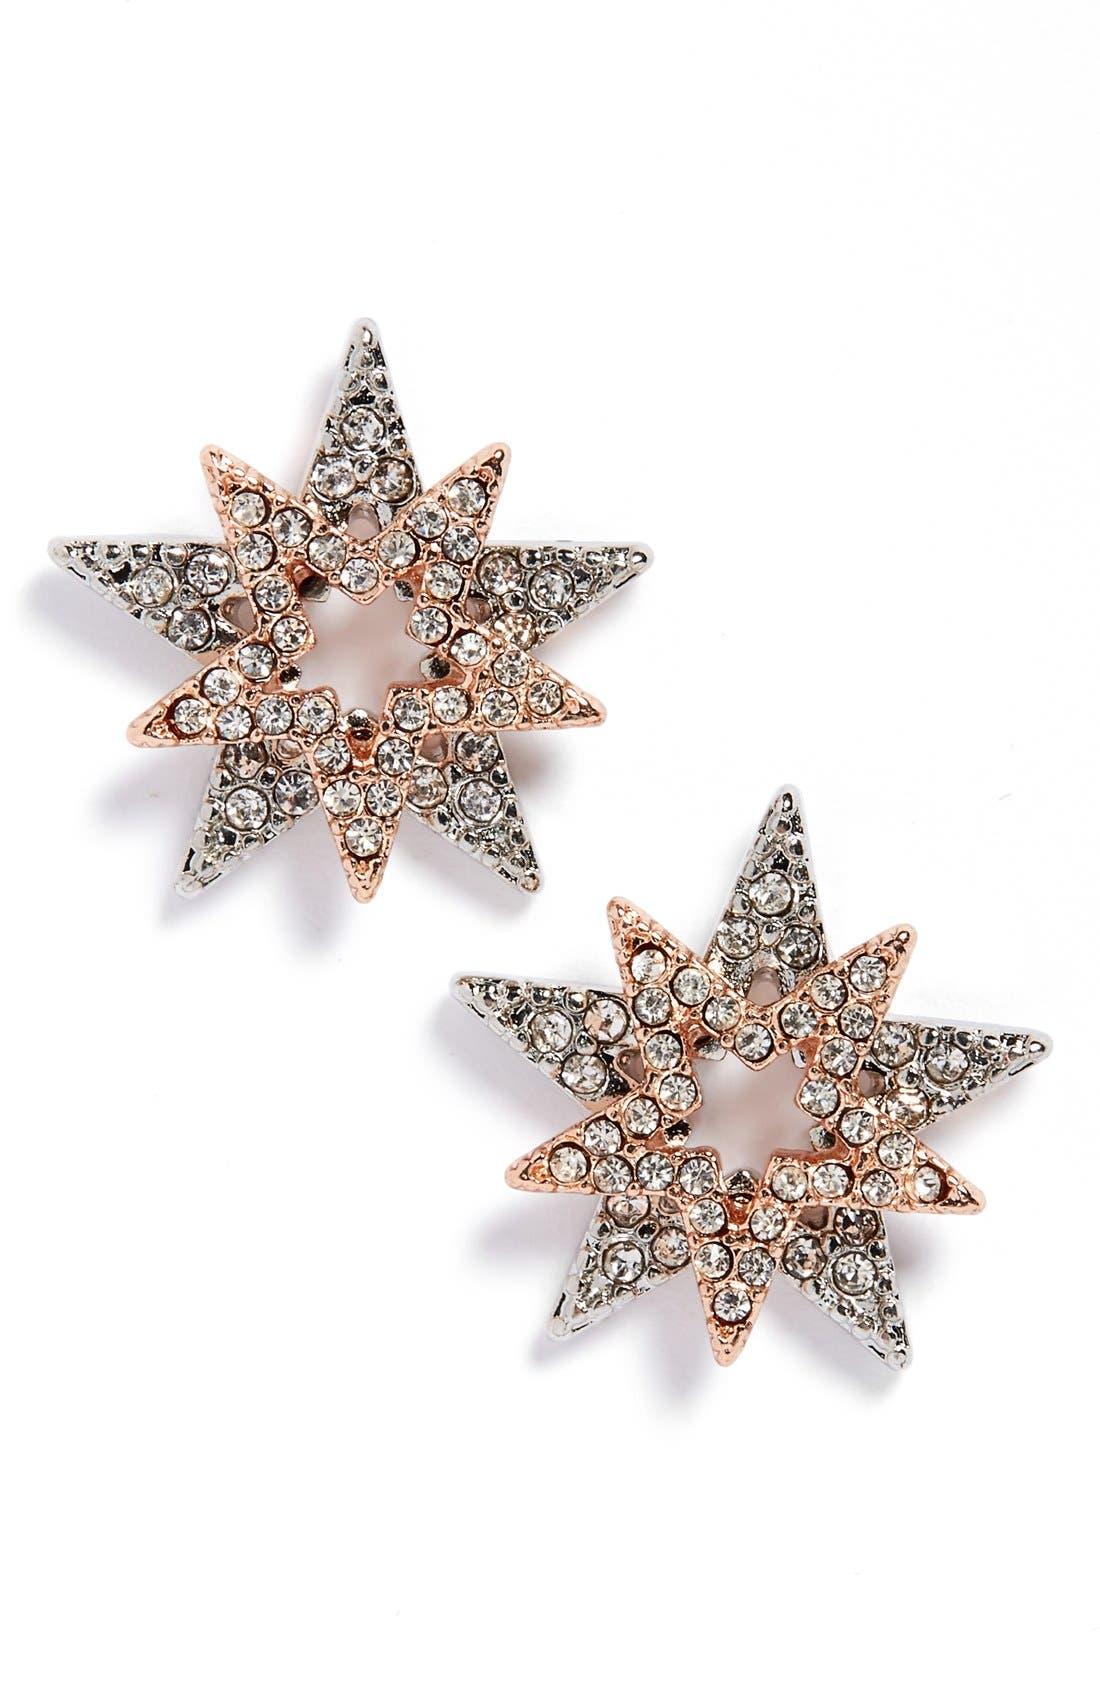 Alternate Image 1 Selected - Sole Society 'Celestial' Stud Earrings